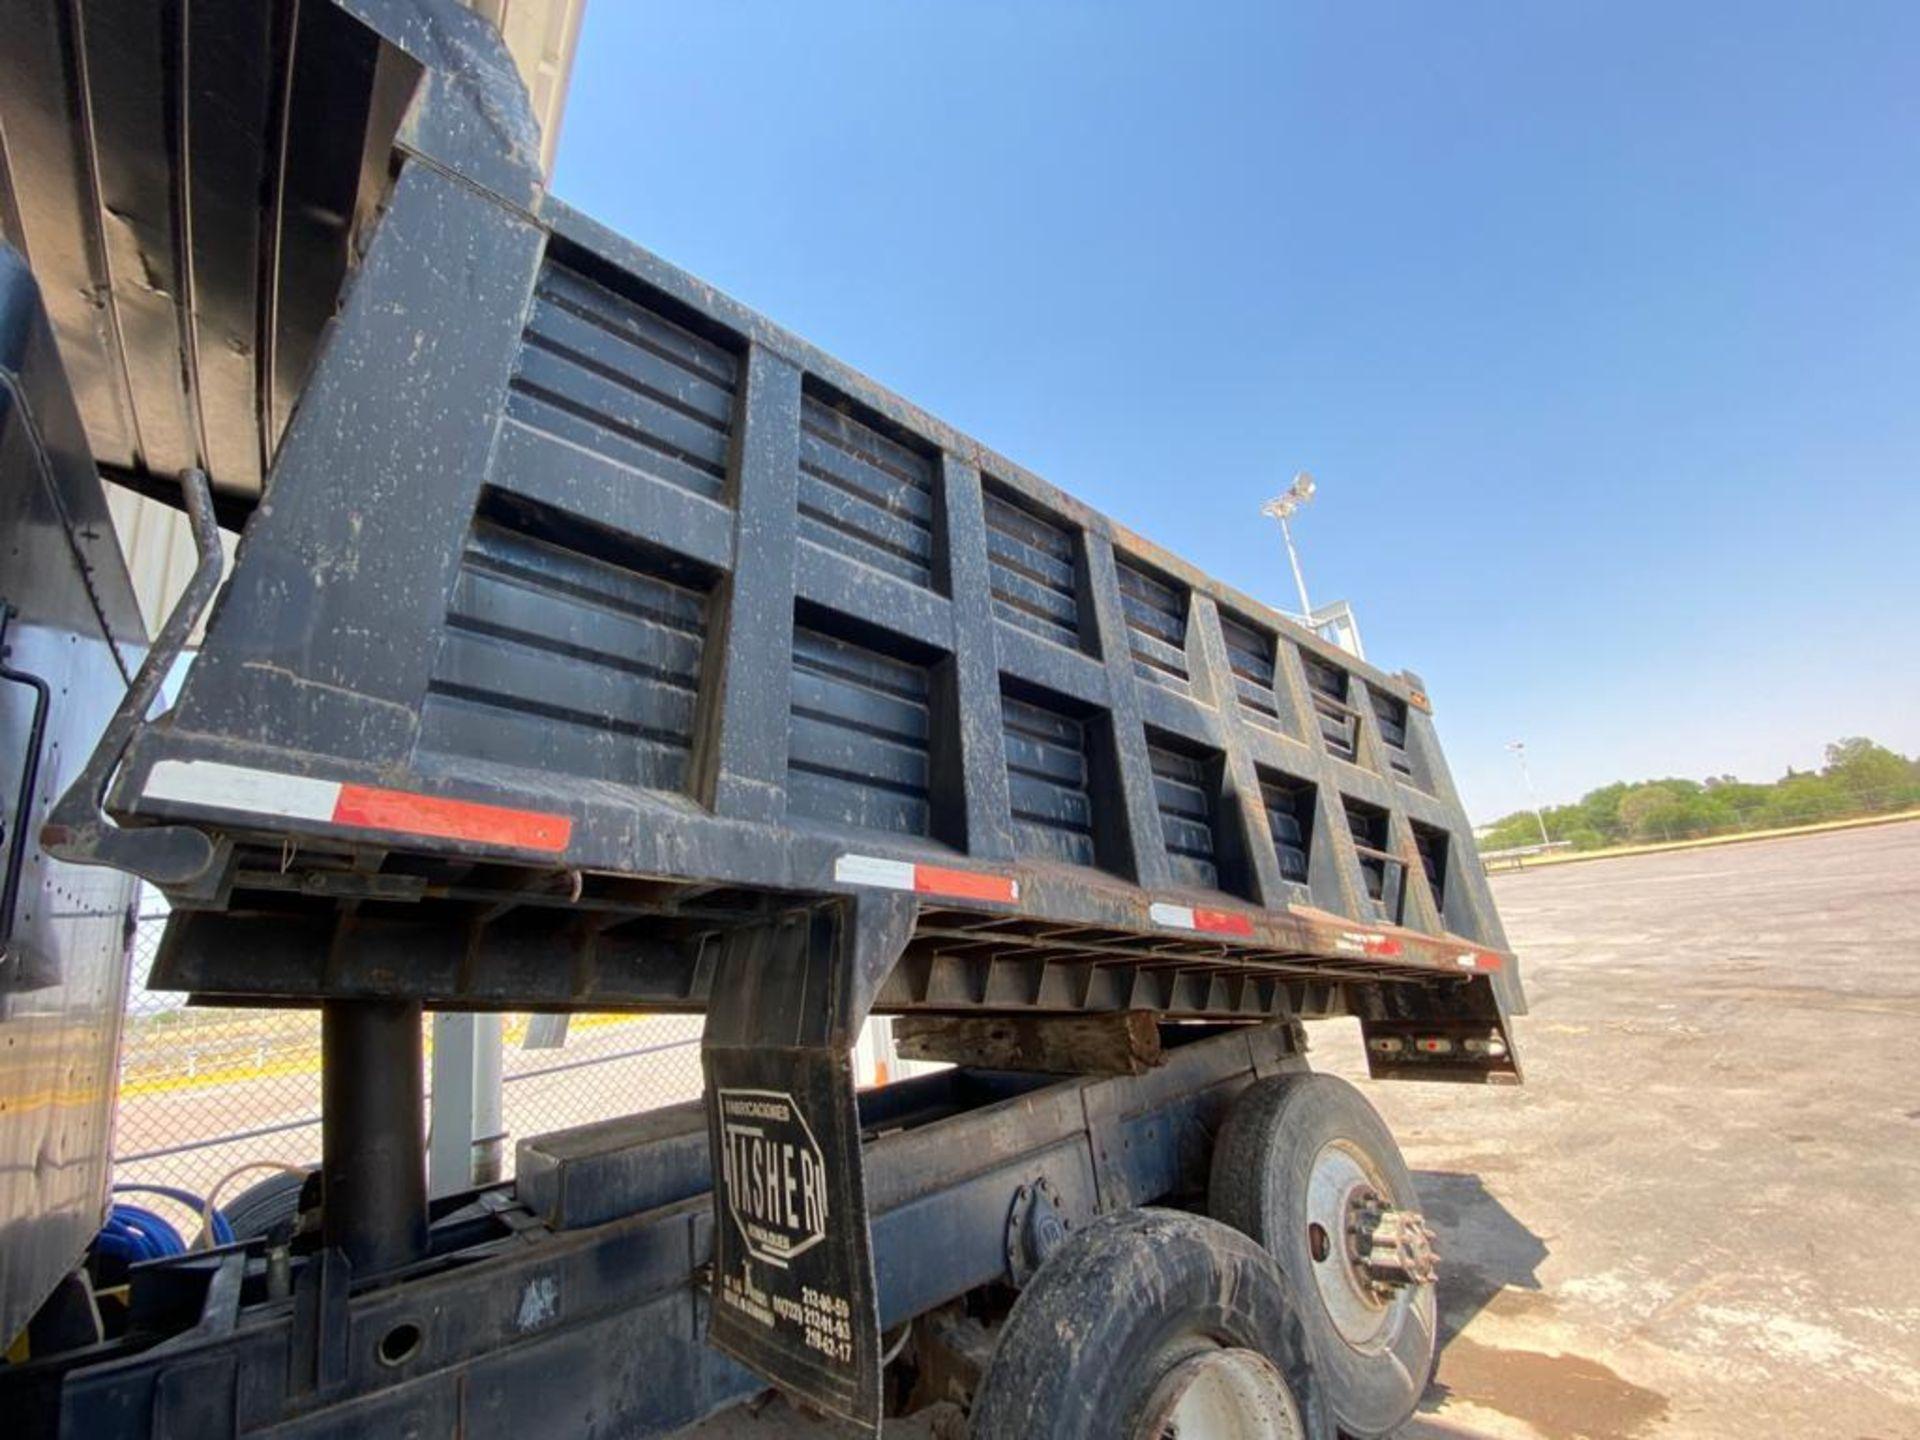 1983 Kenworth Dump Truck, standard transmission of 10 speeds, with Cummins motor - Image 17 of 68